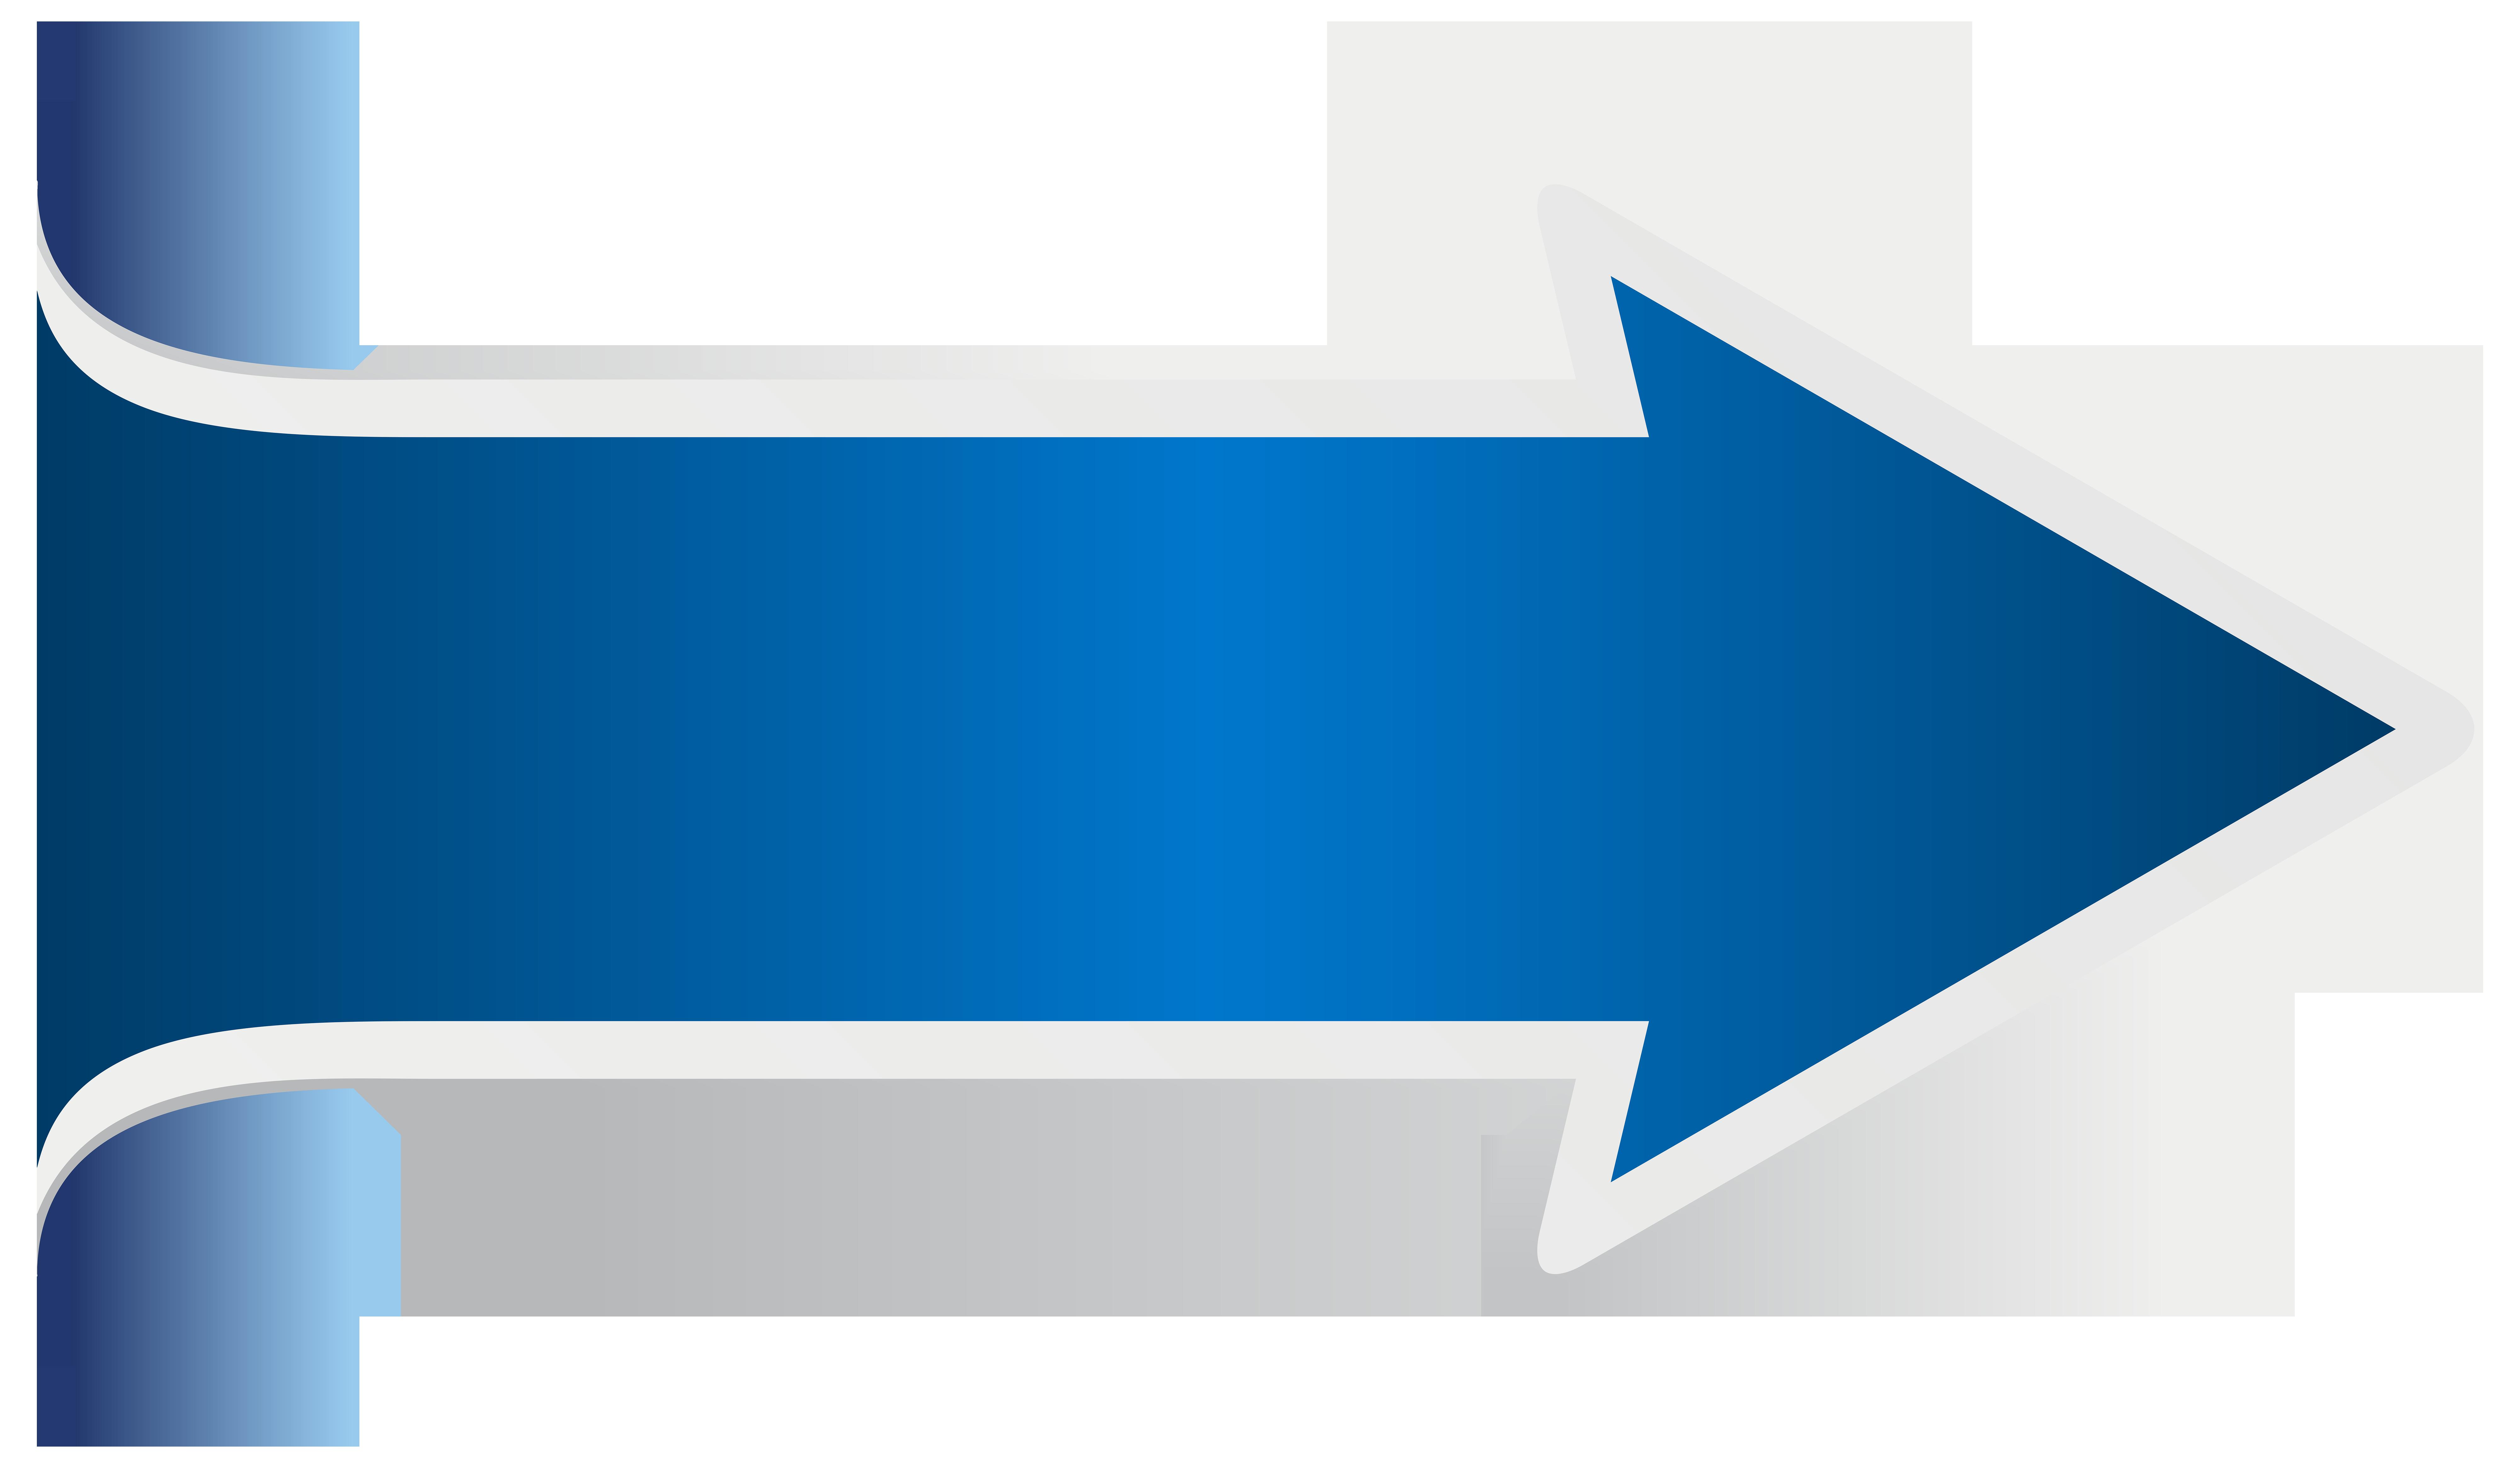 Pin Arrow Clipart Blue Arrow #2 - Arrow HD PNG